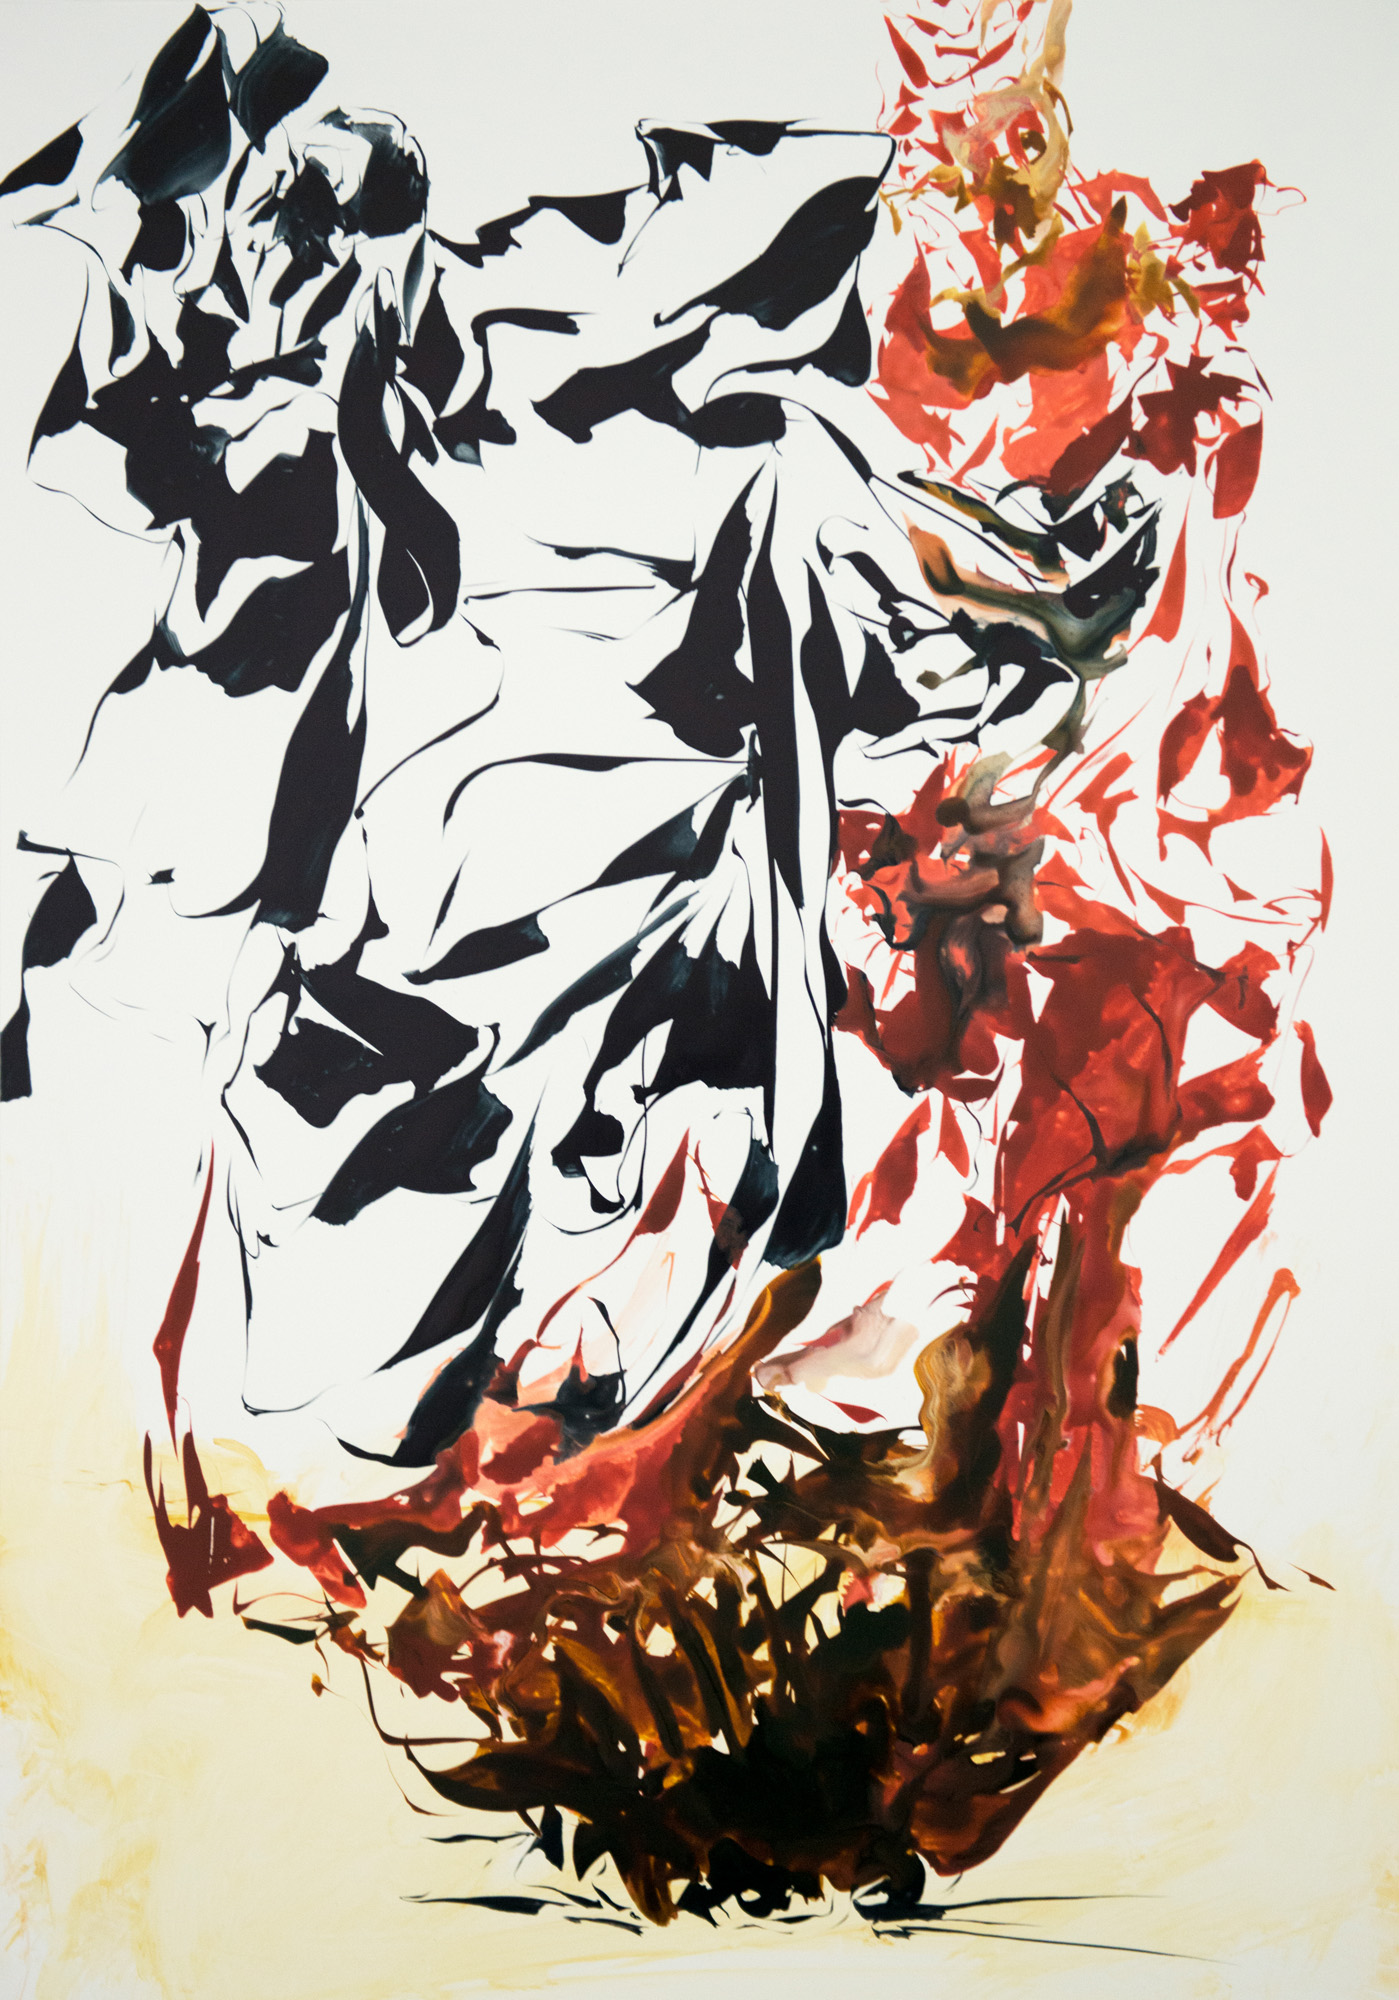 Snagged; 2014; 70 x 50 cm